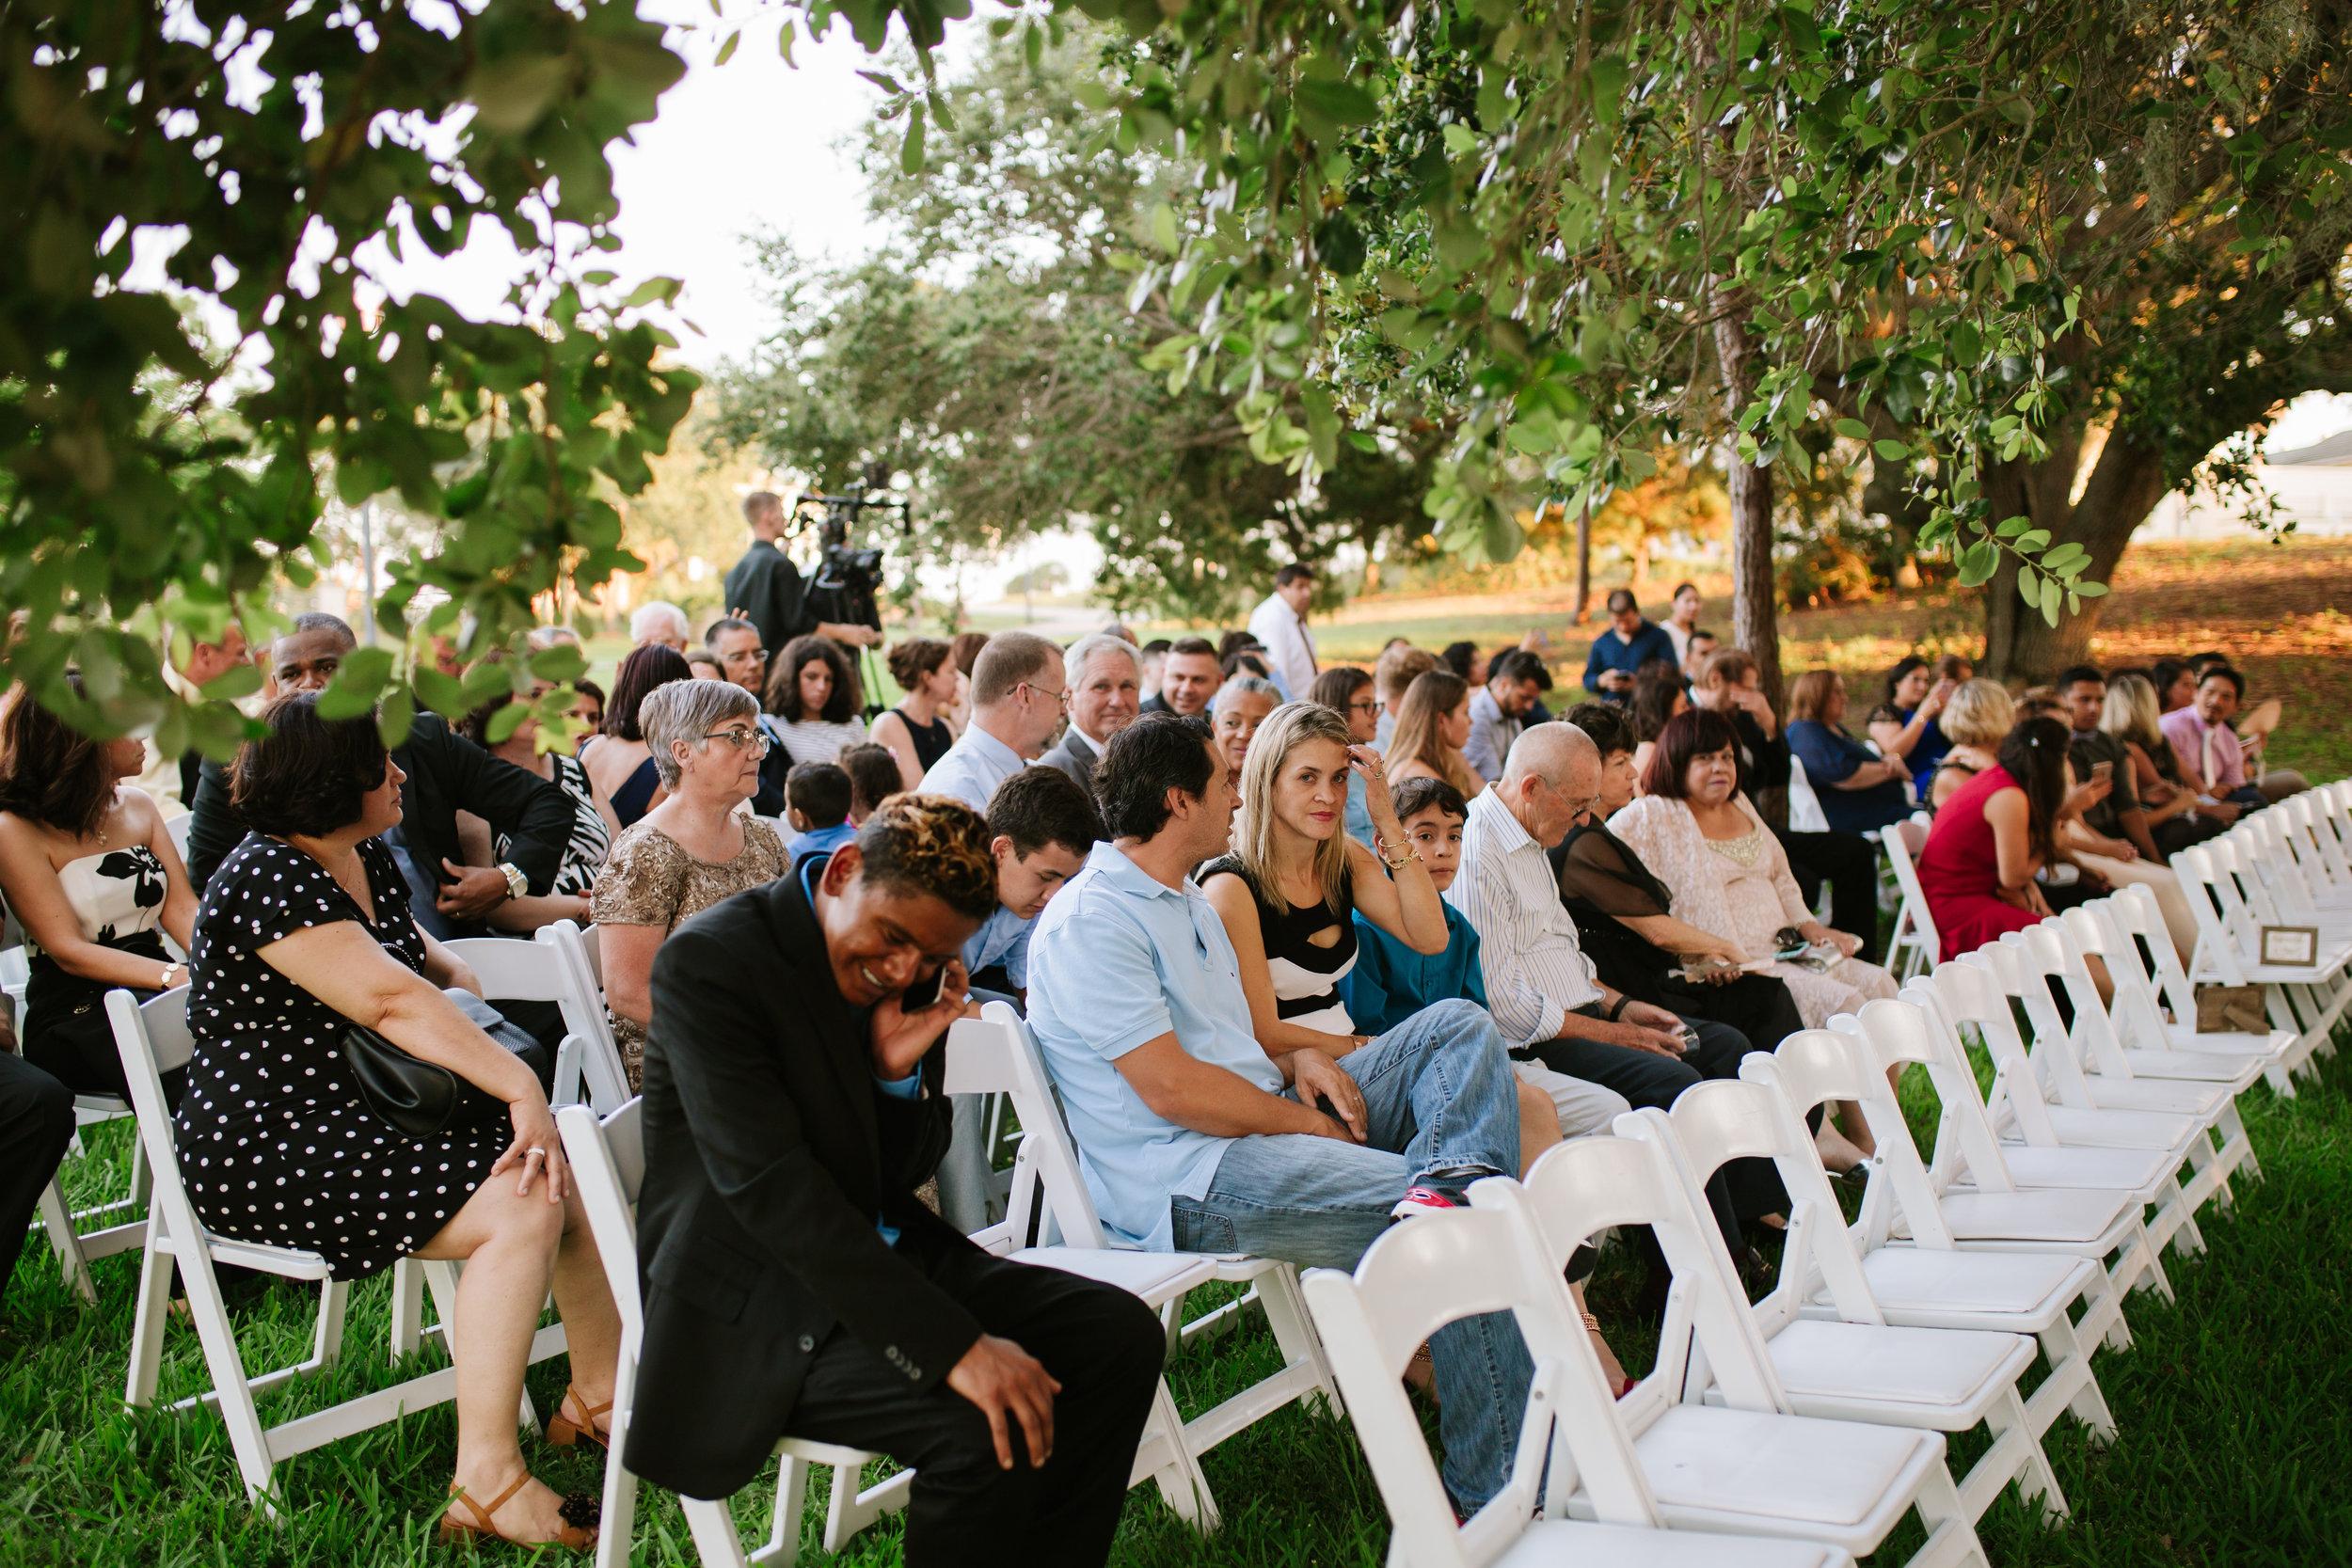 2017.05.23 Barbara and Mauricio Sales Port St Lucie Wedding (299 of 772).jpg